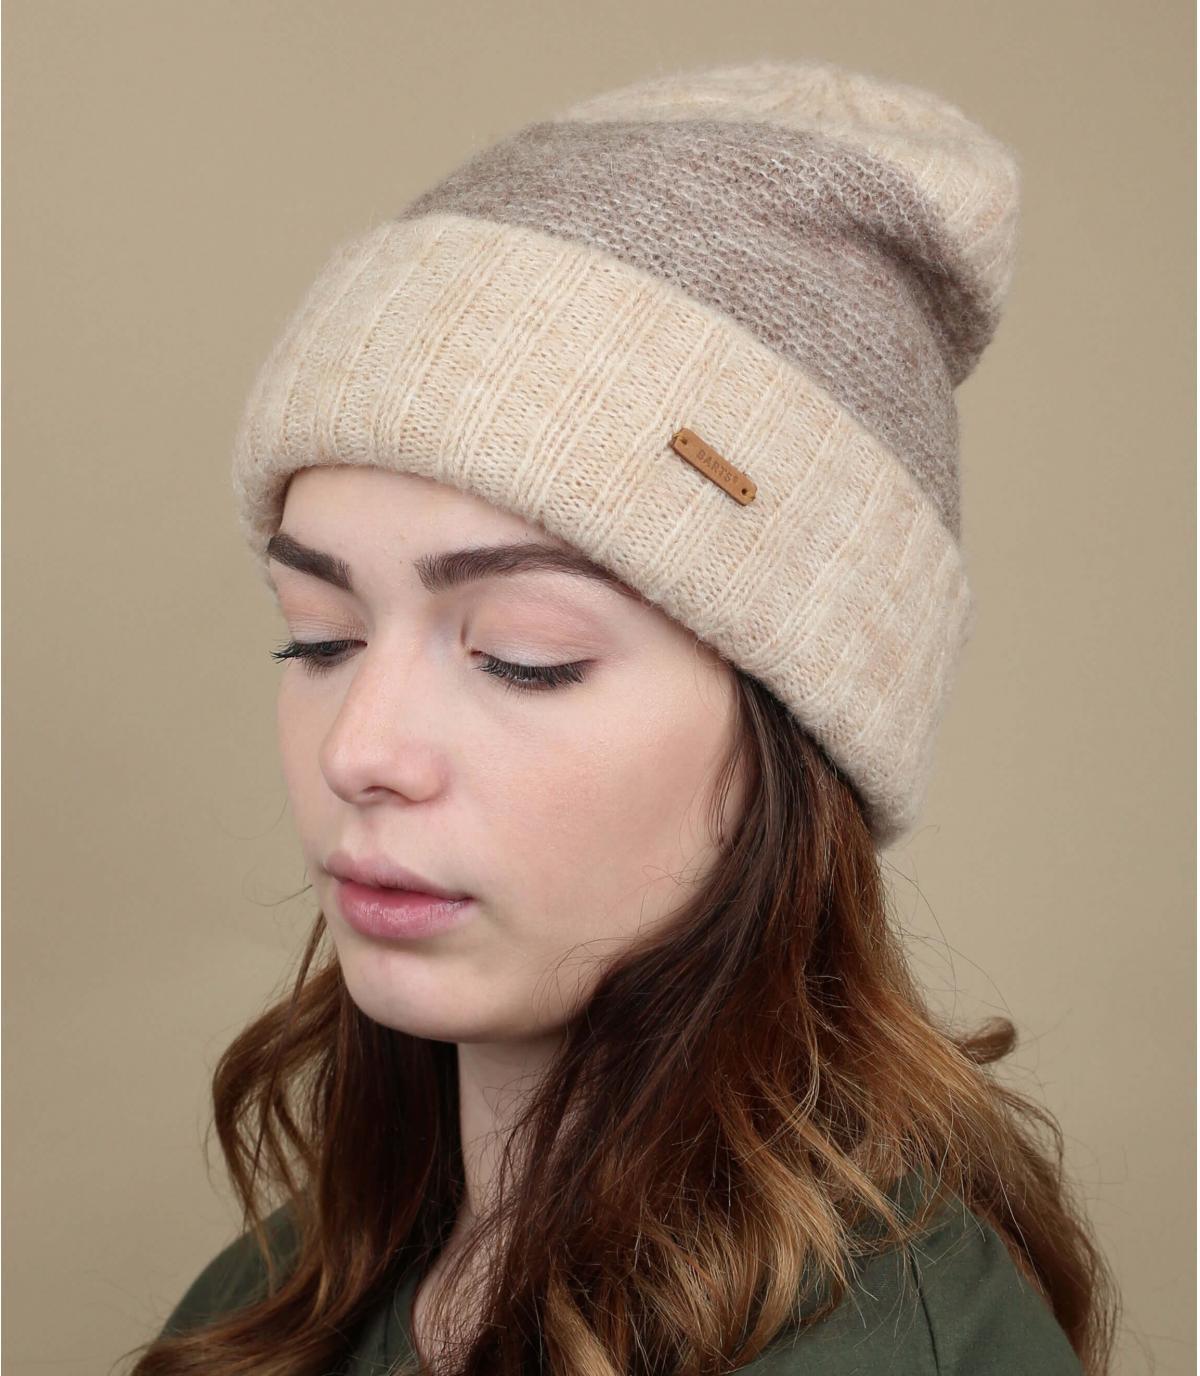 cappello polsino in lana beige